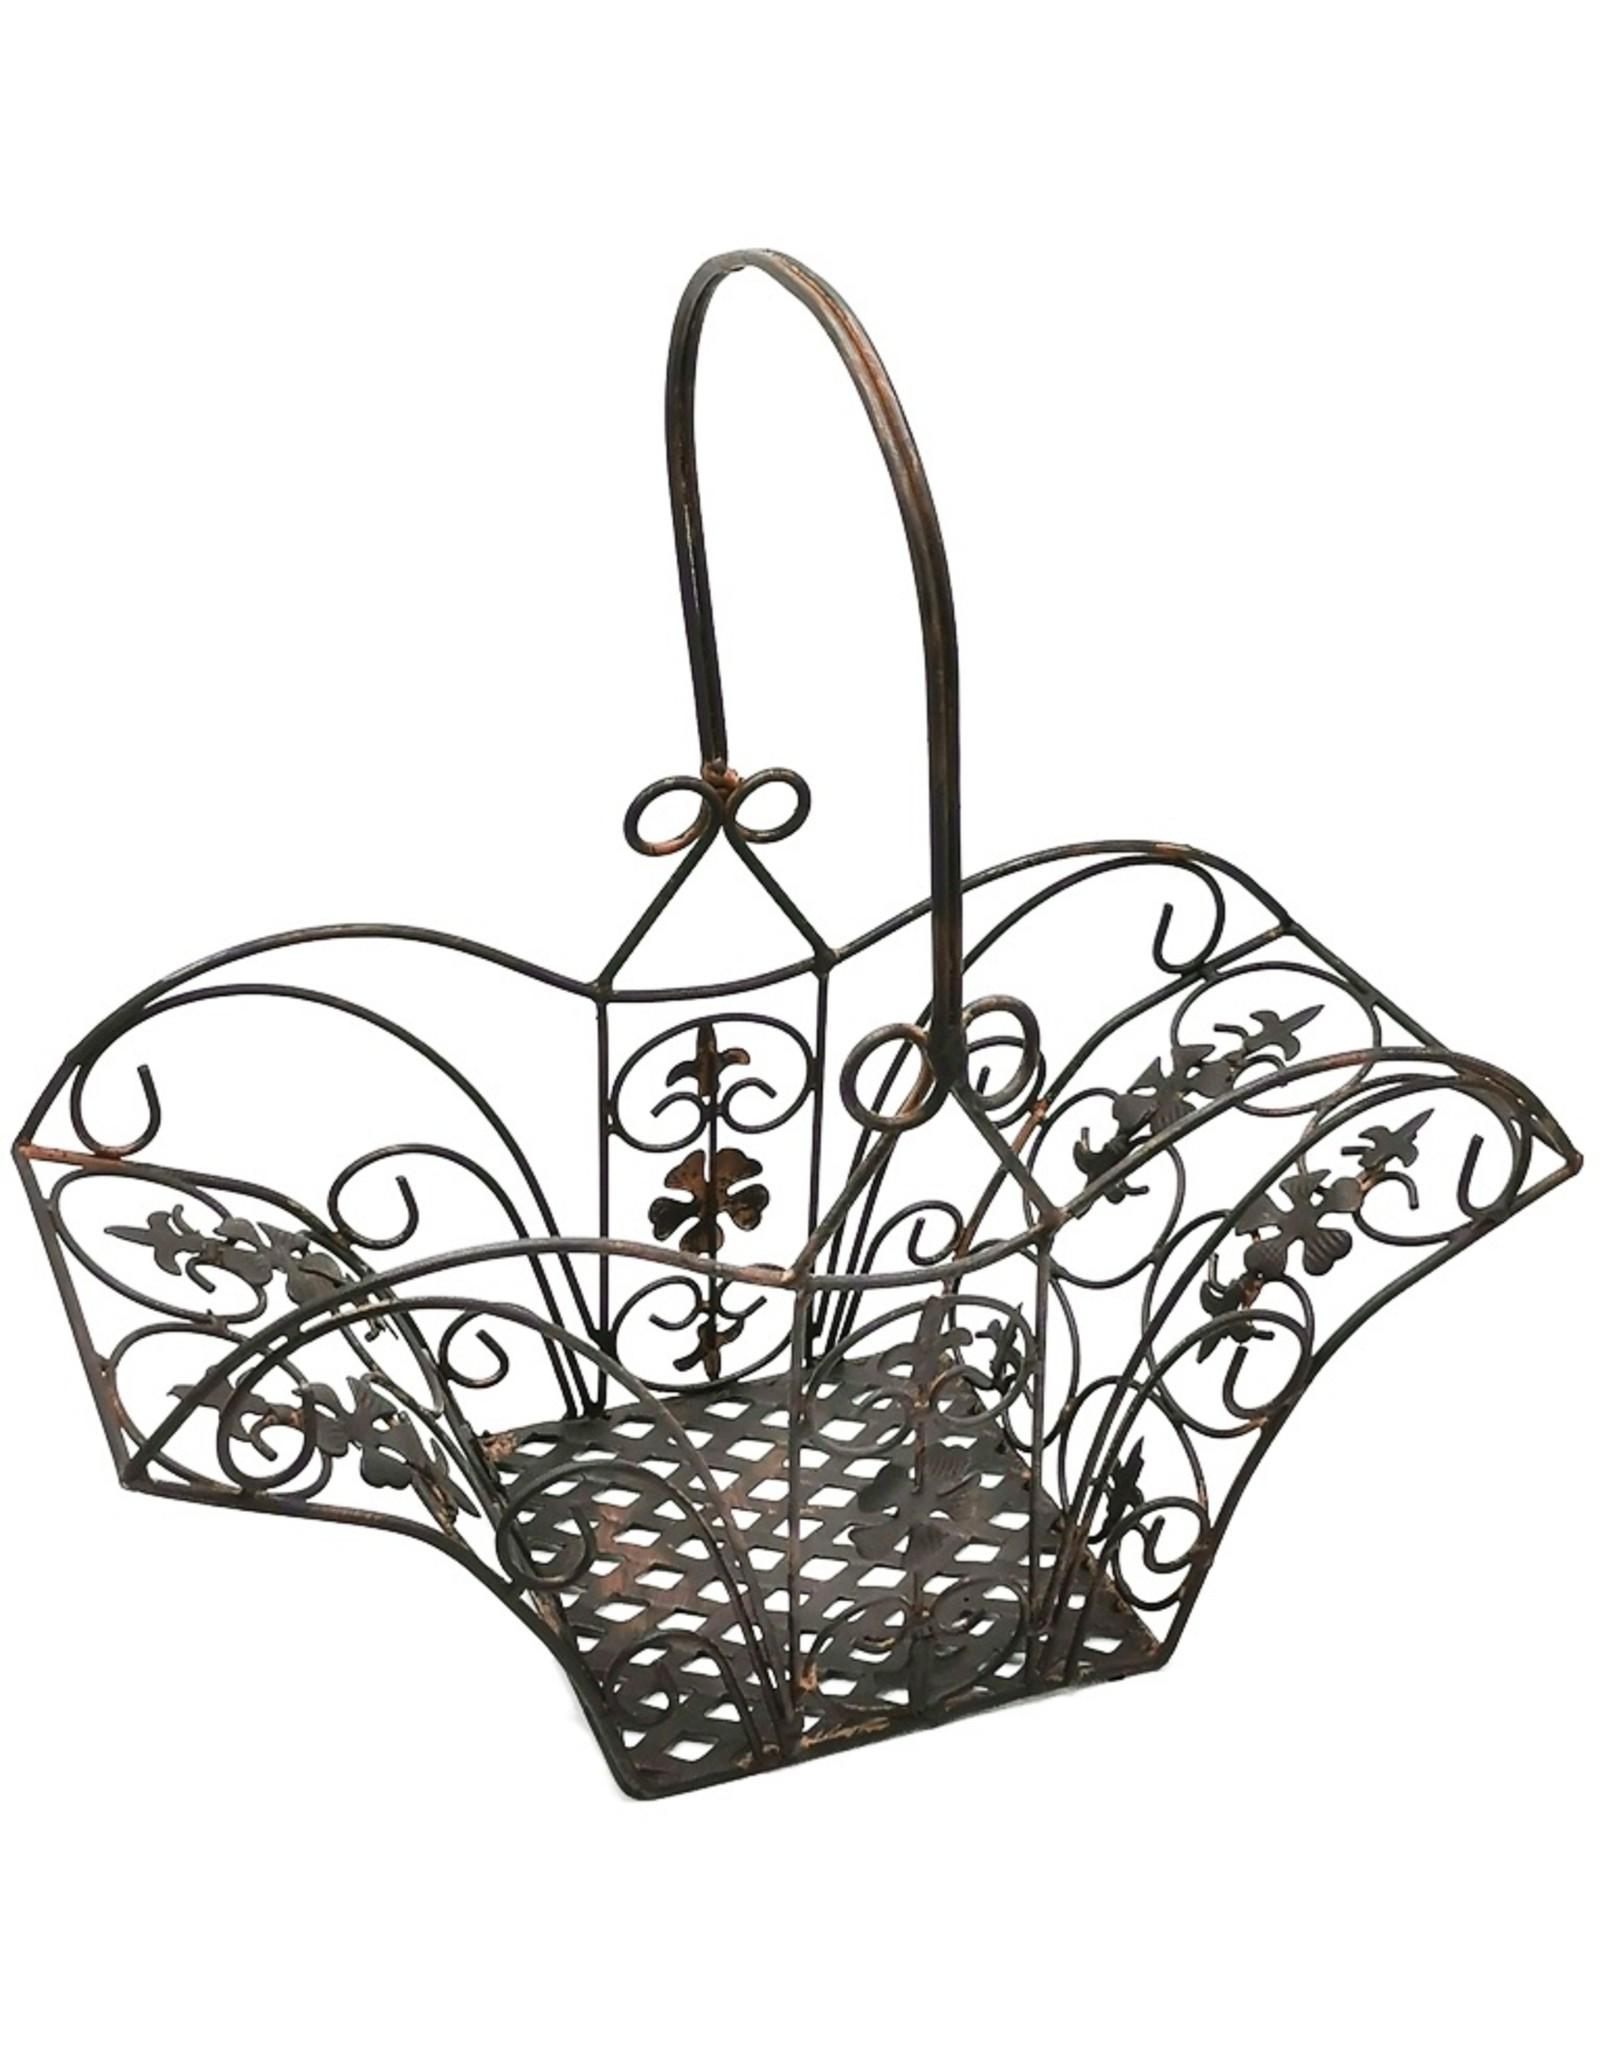 Decoratieve metalen manden Miscellaneous - Decorative metal Vintage basket - set of 3